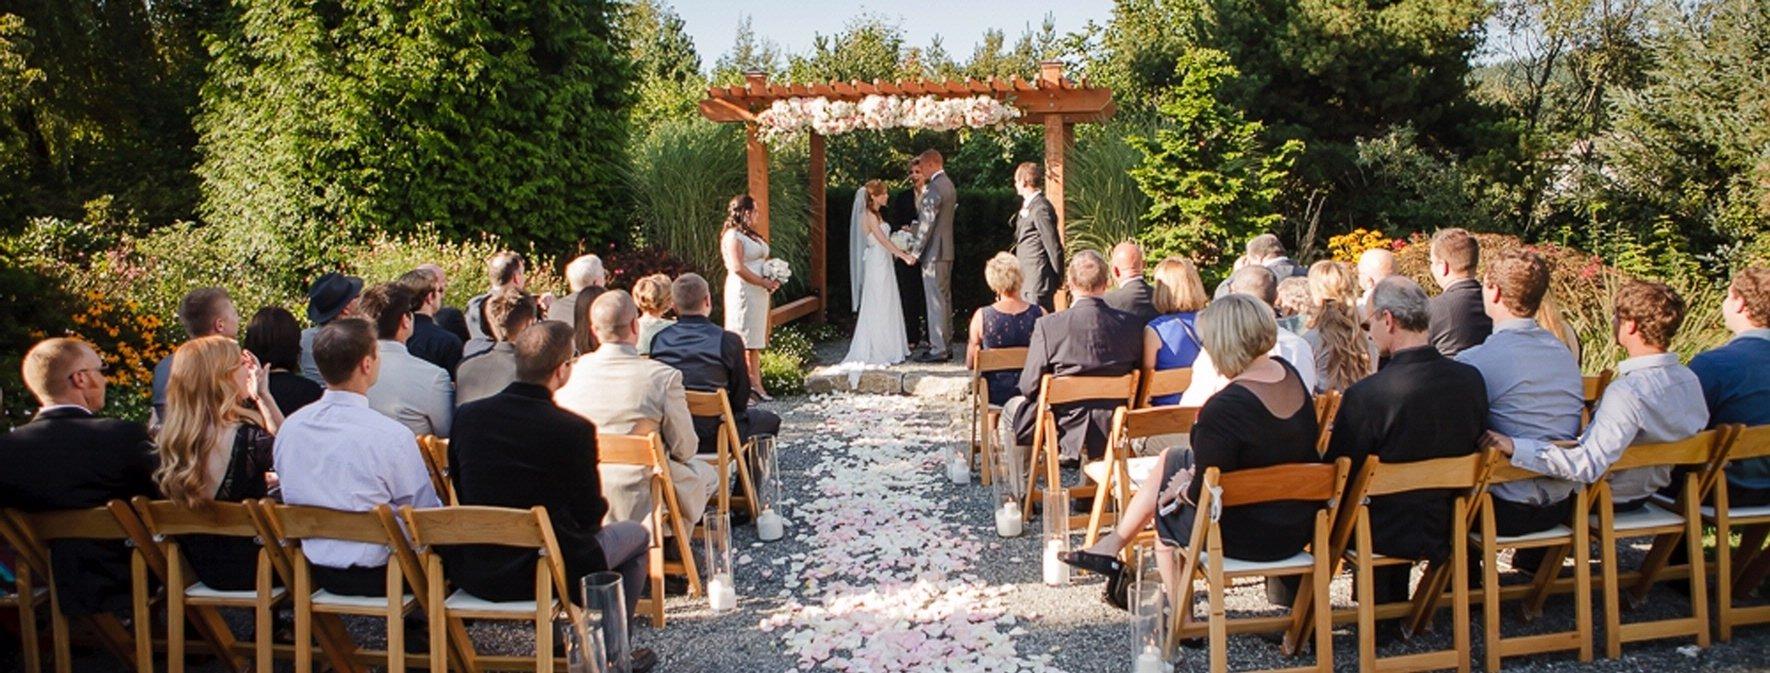 Small Wedding Ideas | 10 Ideal Wedding Ideas For Small Weddings